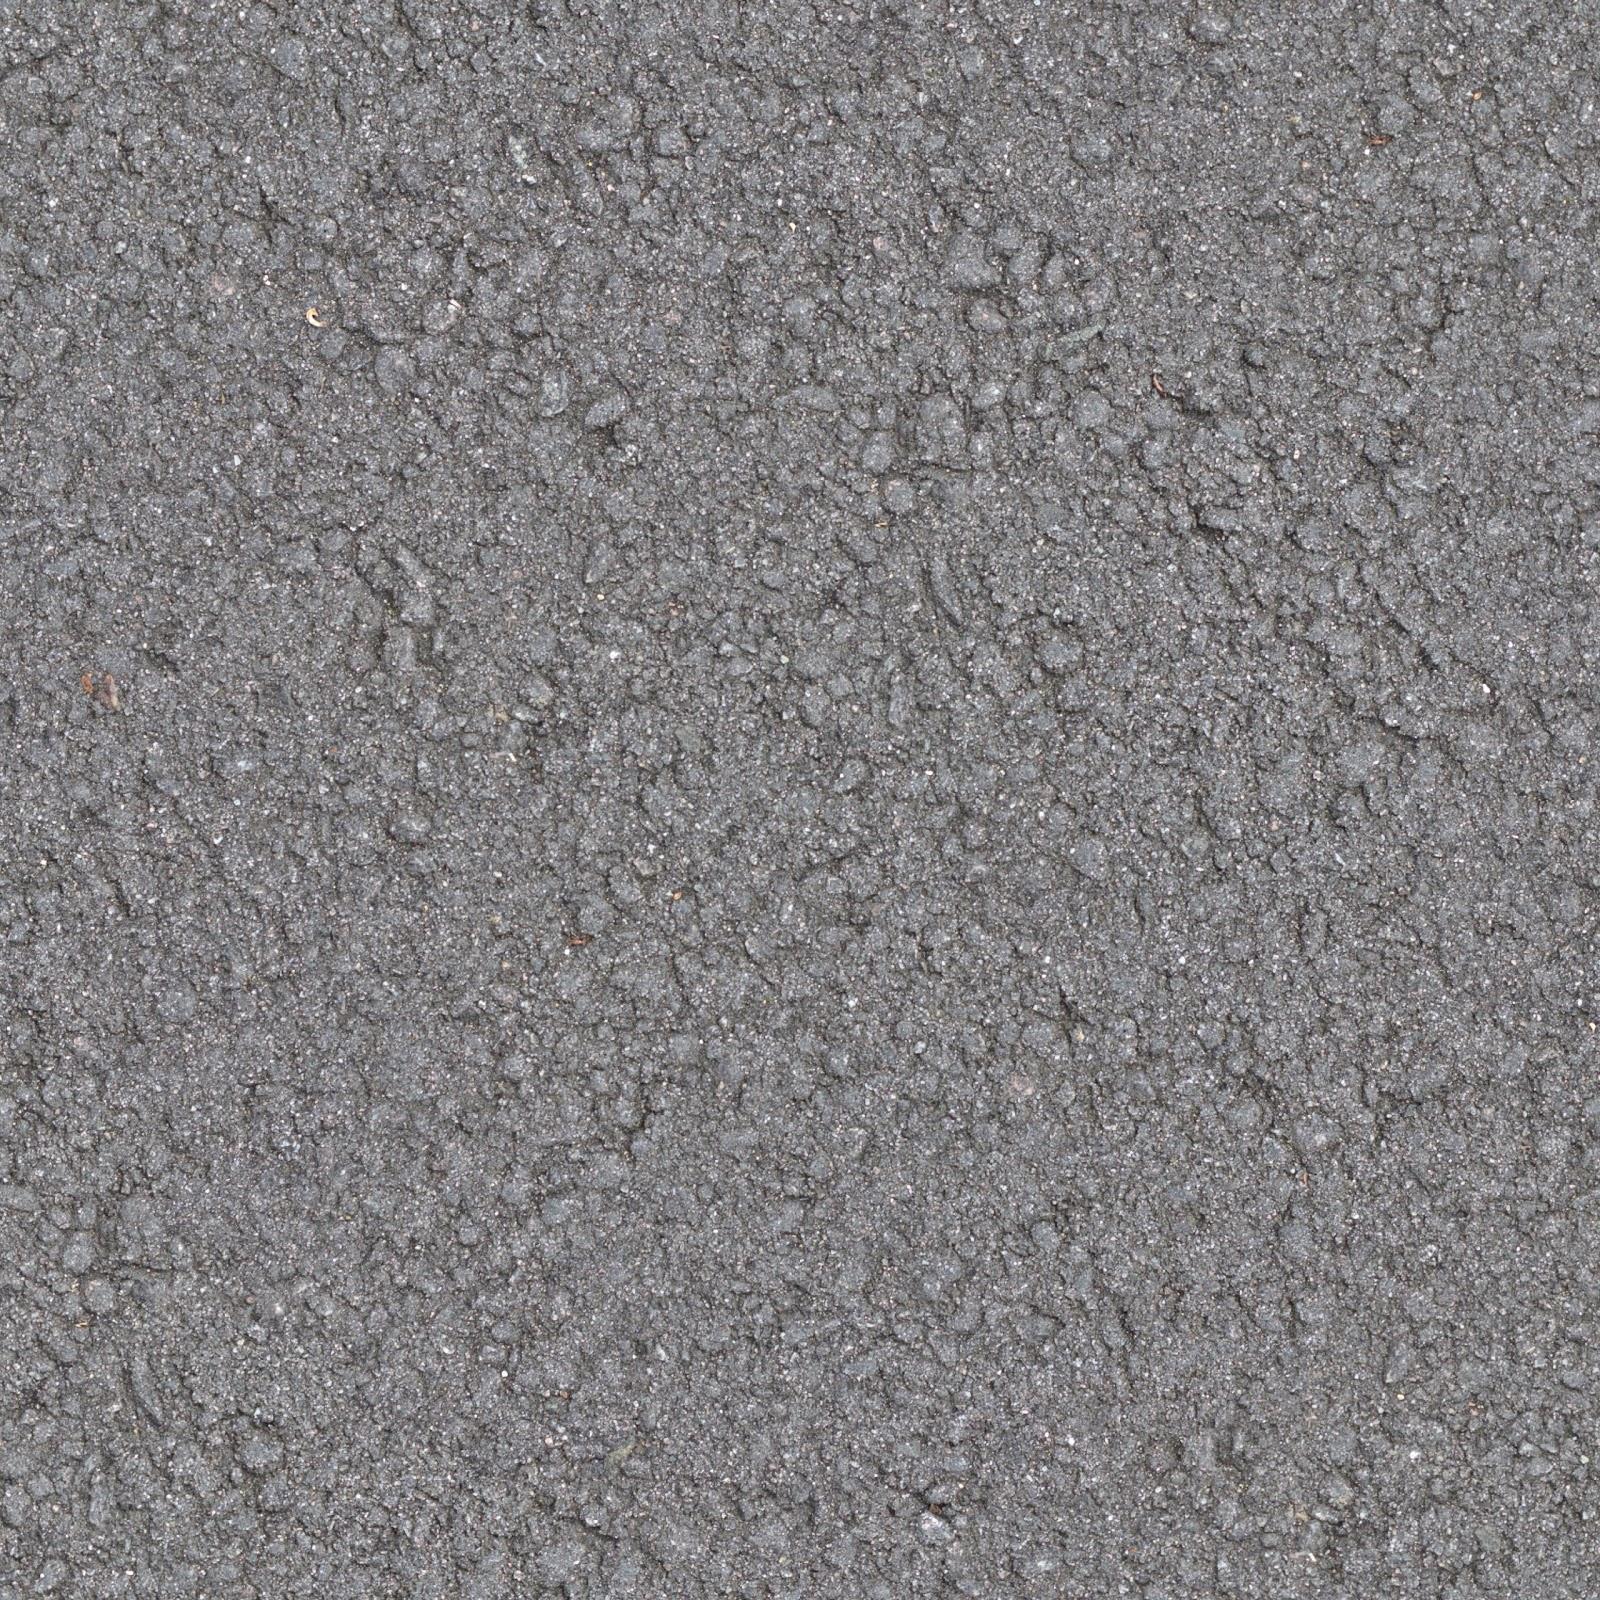 High Resolution Seamless Textures Seamless Asphalt Tarmac